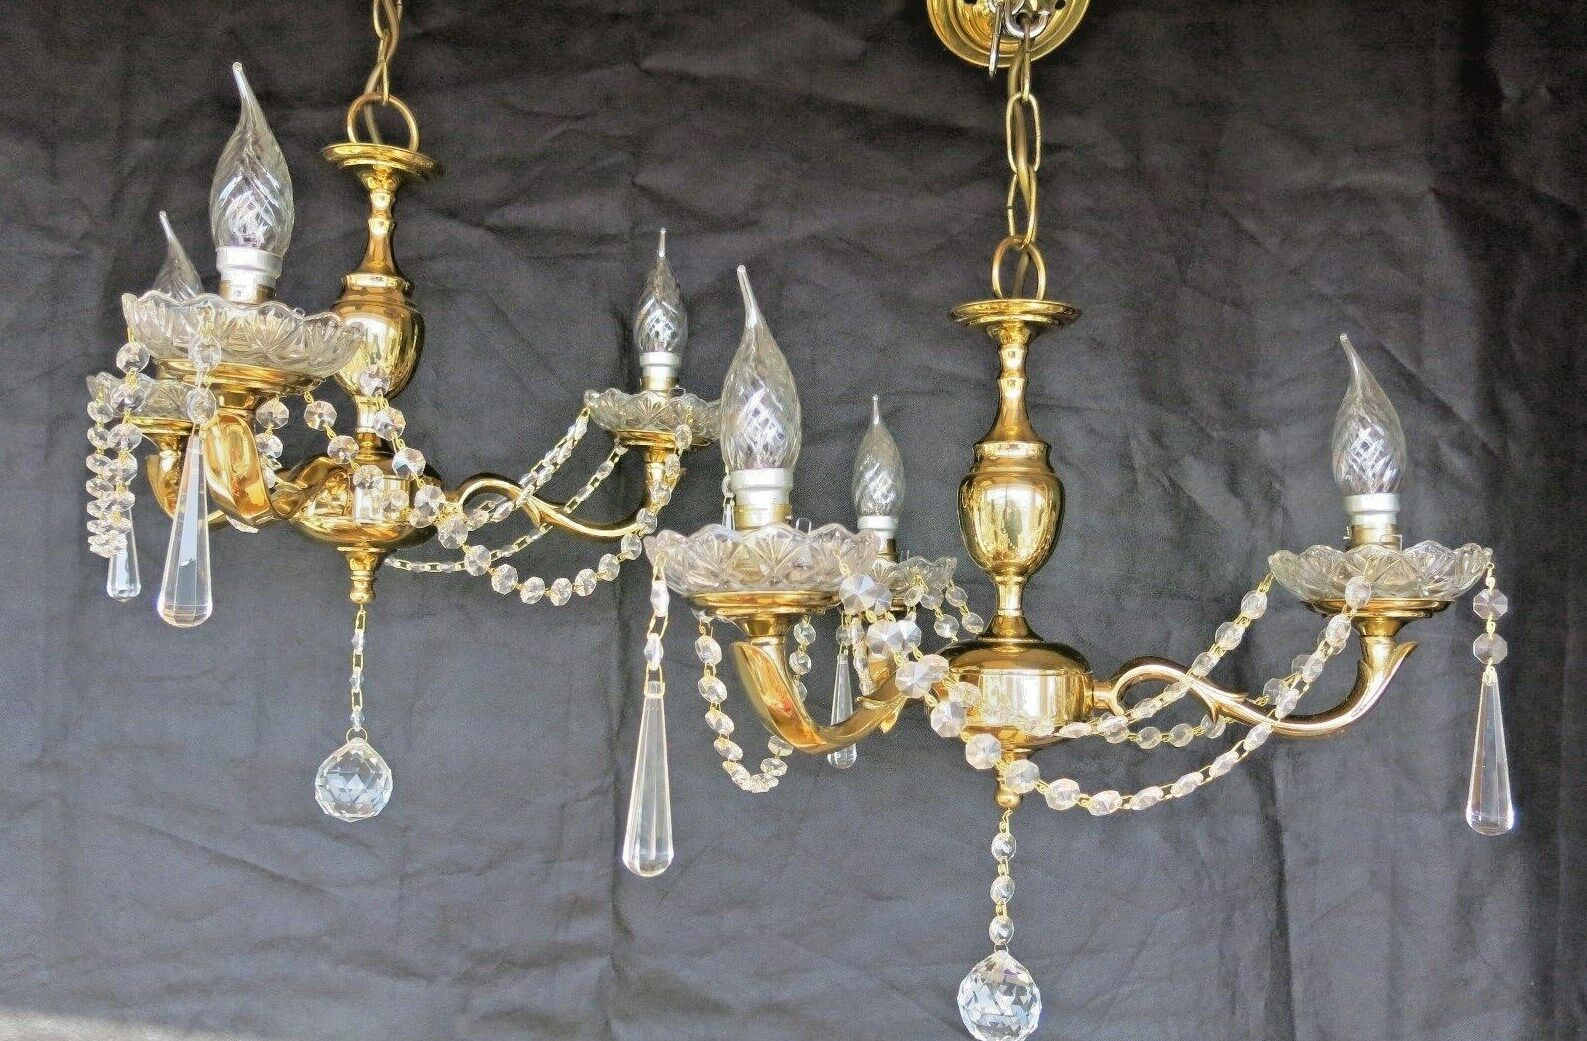 Sporting Lampadario In Ottone E Porcellana Dipinta A Mano Lamps Decorative Arts